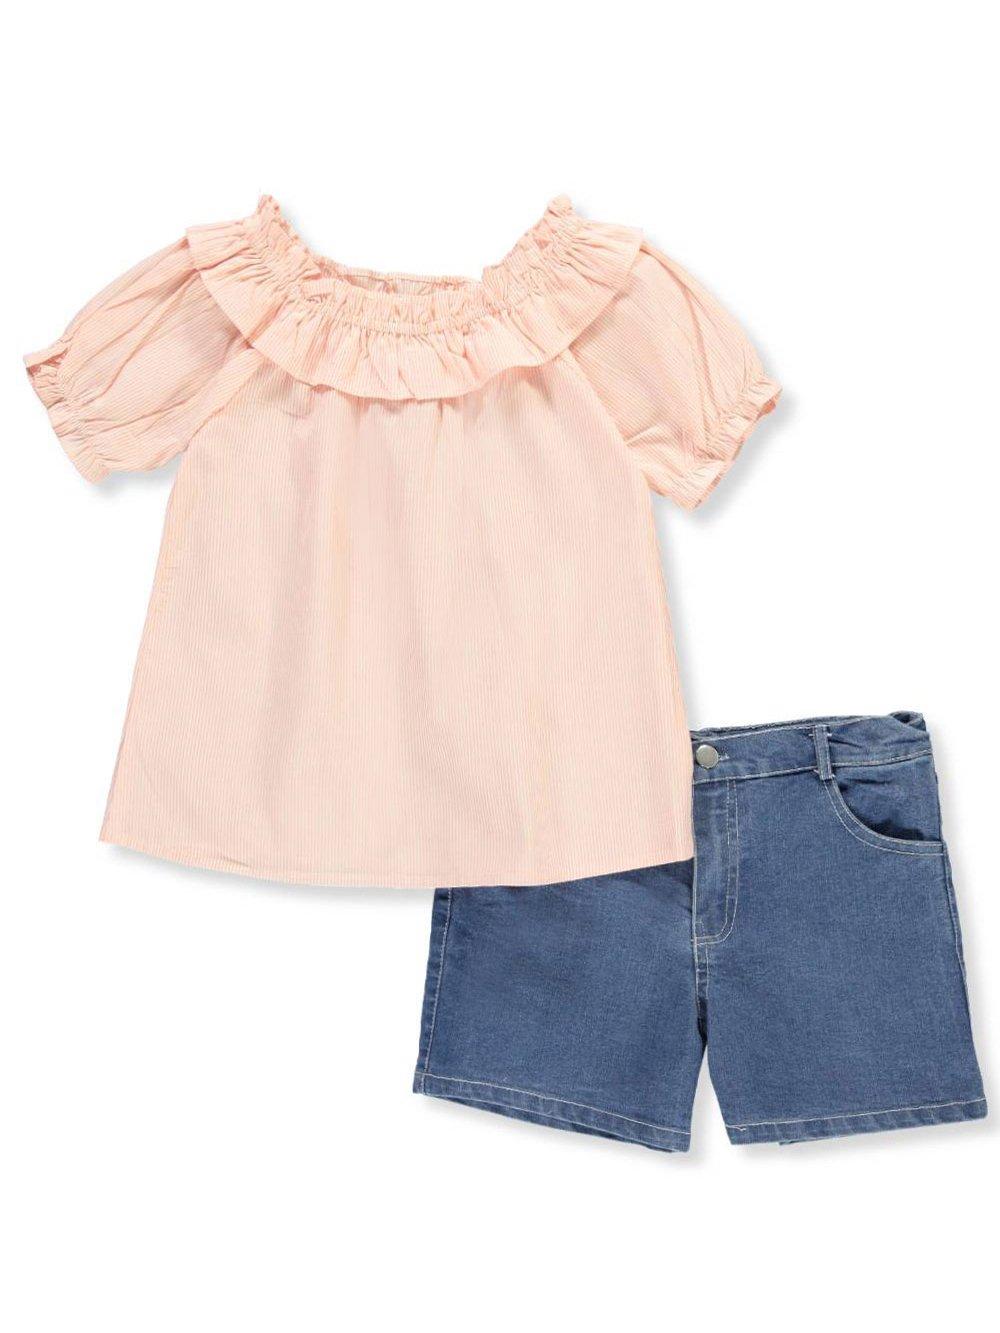 Girls Luv Pink Big Big Girls' 2-Piece Short Set Outfit - Peach Multi, 10-12